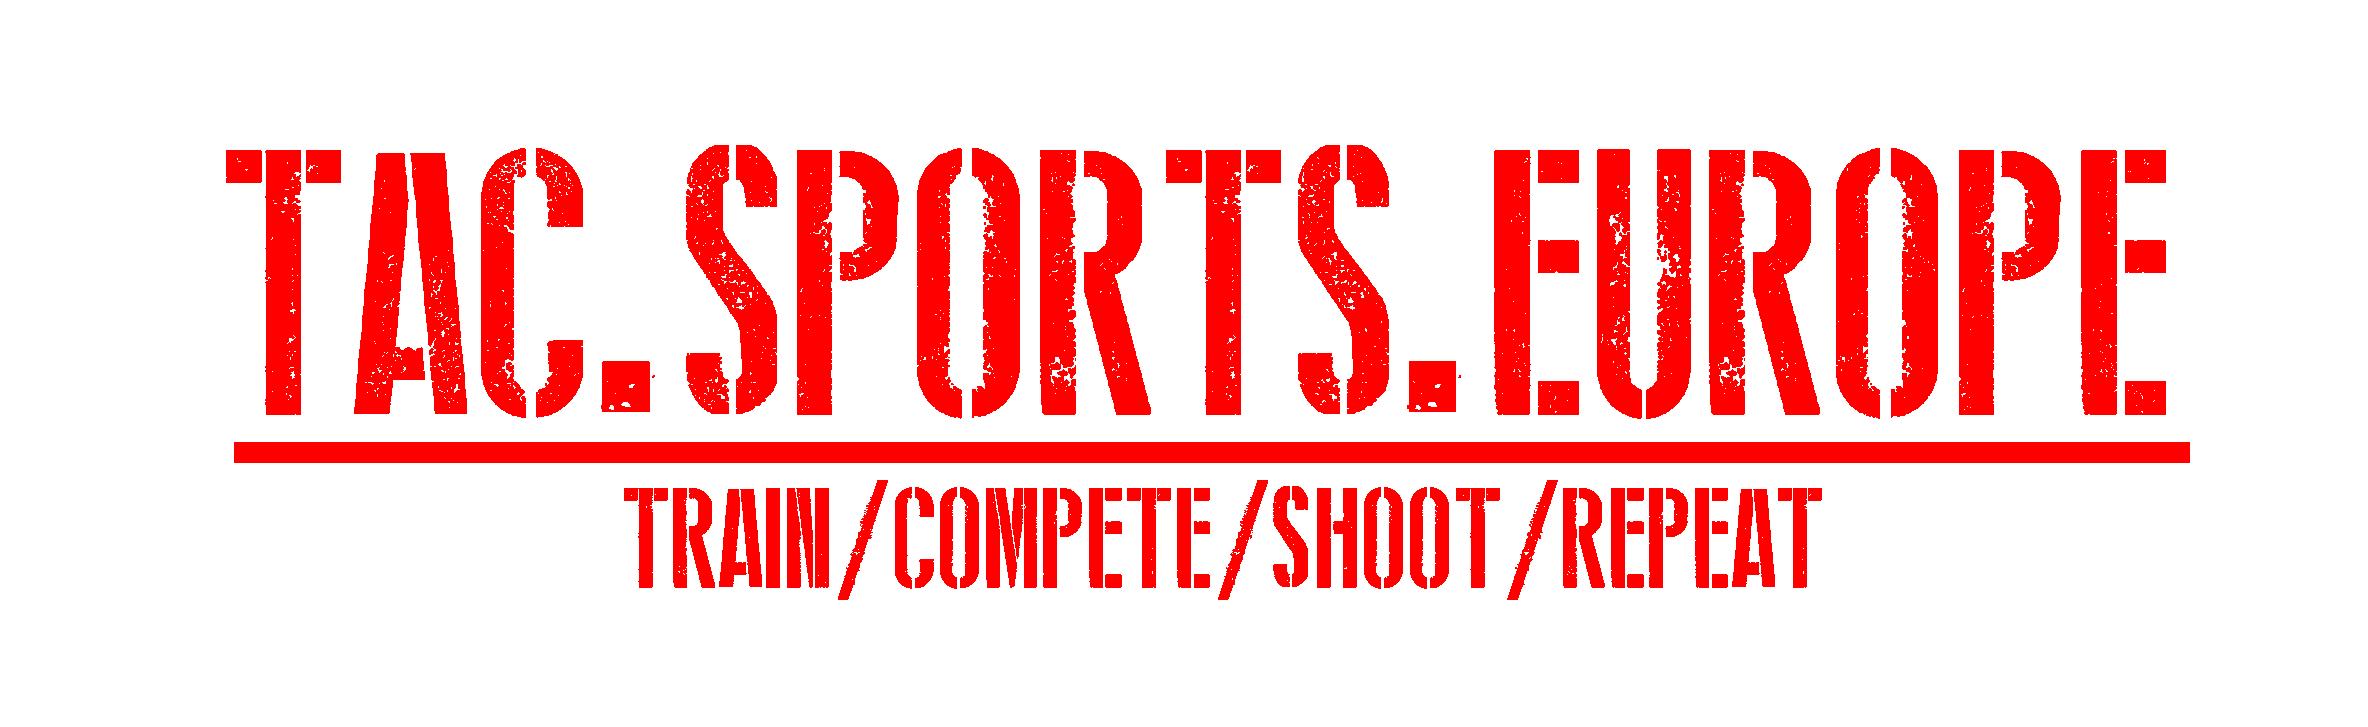 TacSports Europe